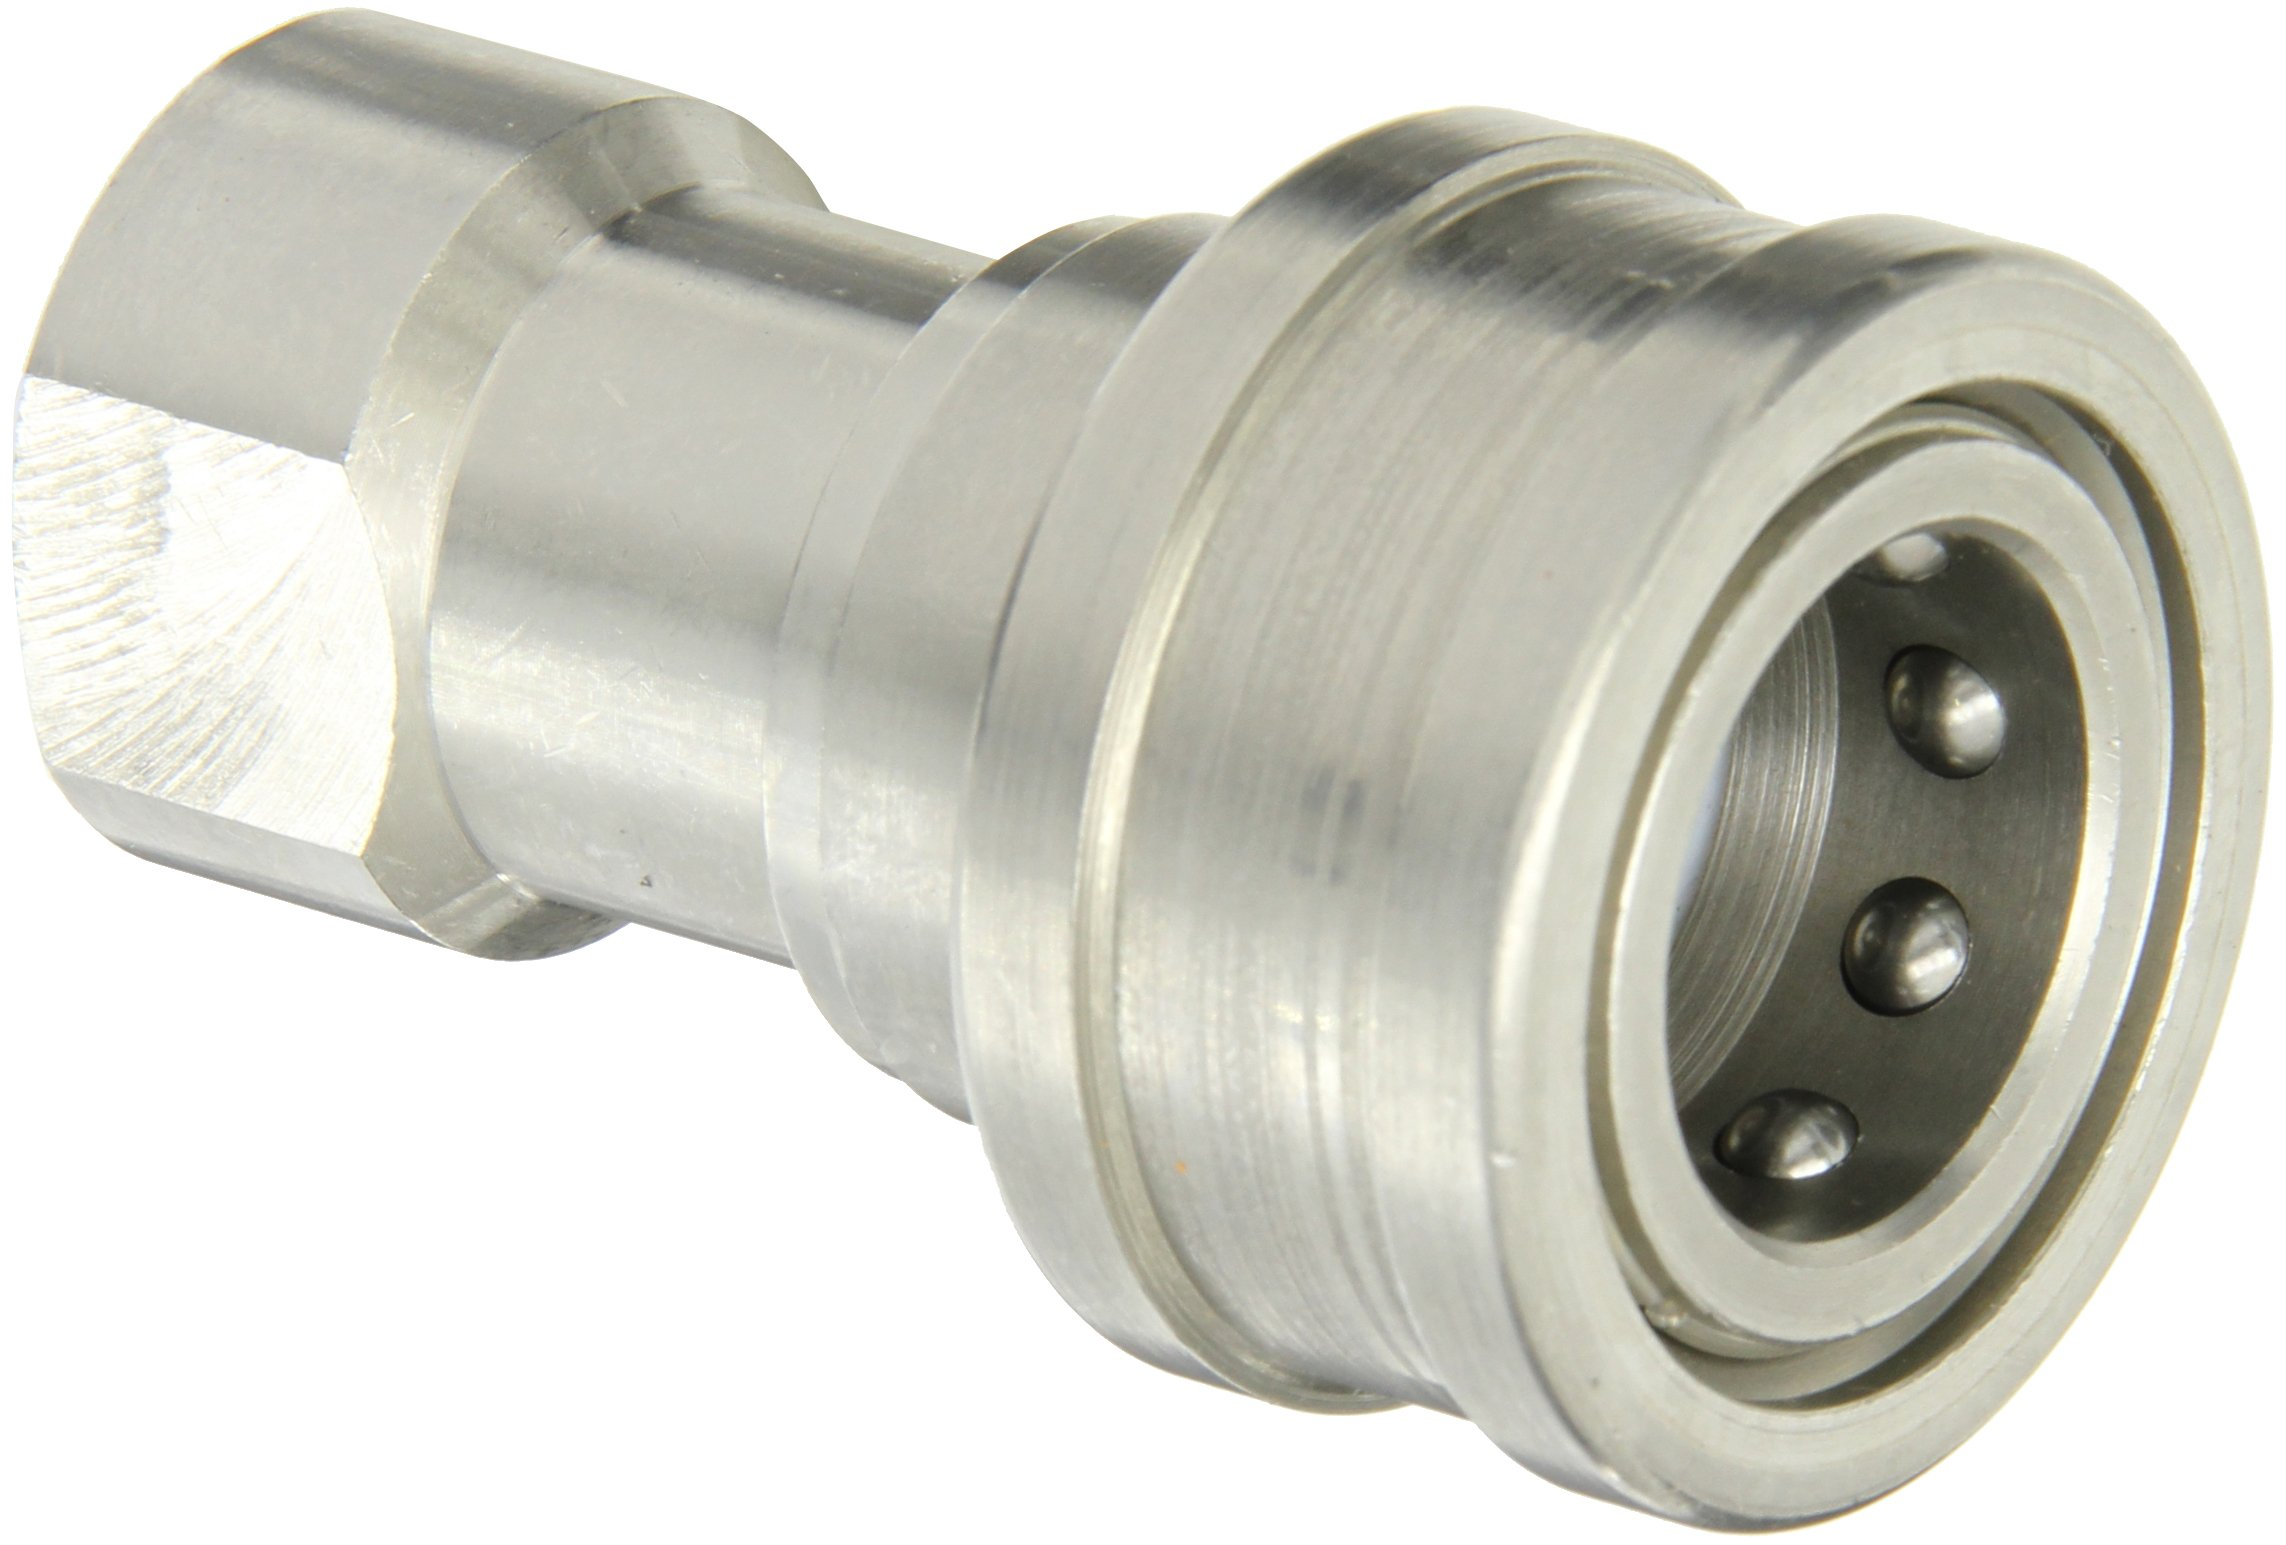 Eaton Hansen LL4HP26 Stainless Steel 303 ISO-B Interchange Hydraulic Fitting, Socket with Valve, 1/2''-14 NPTF Female, 1/2'' Body